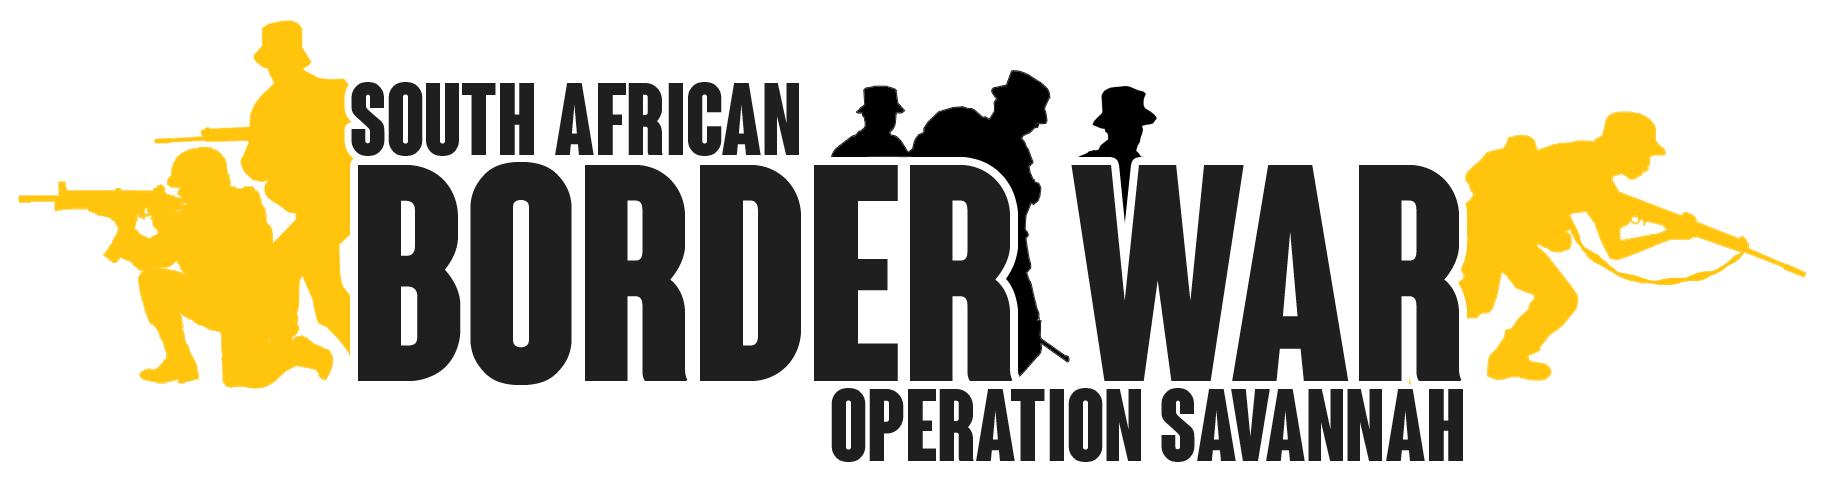 South_African_Border_War_Logo_5.png